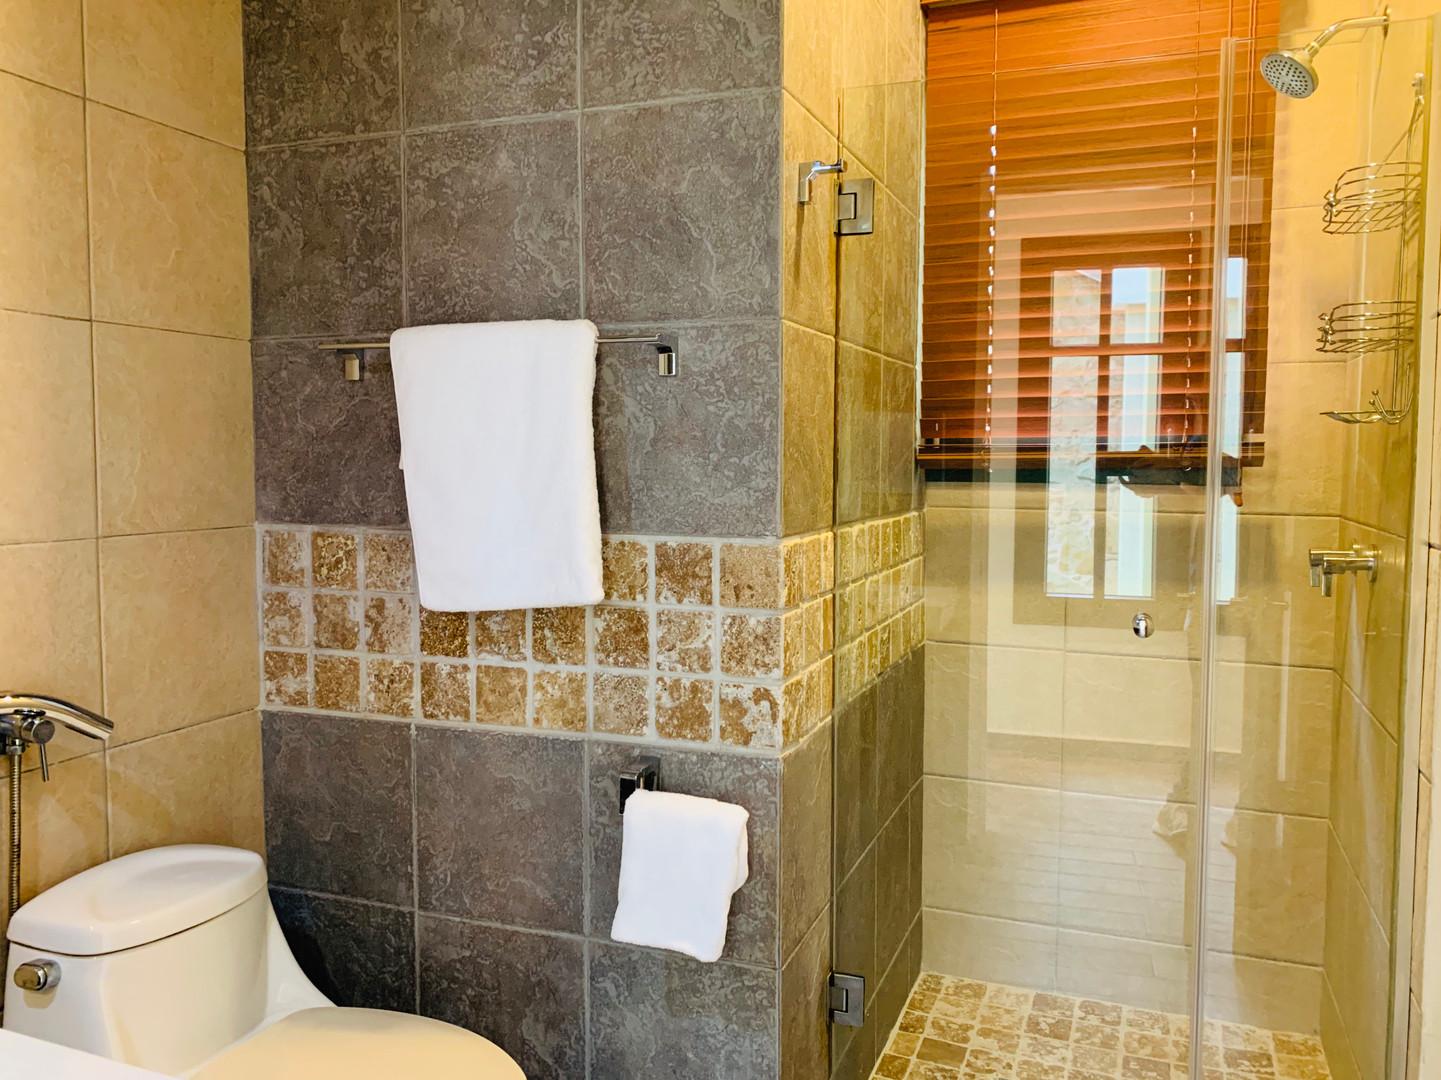 baño2.1.jpg